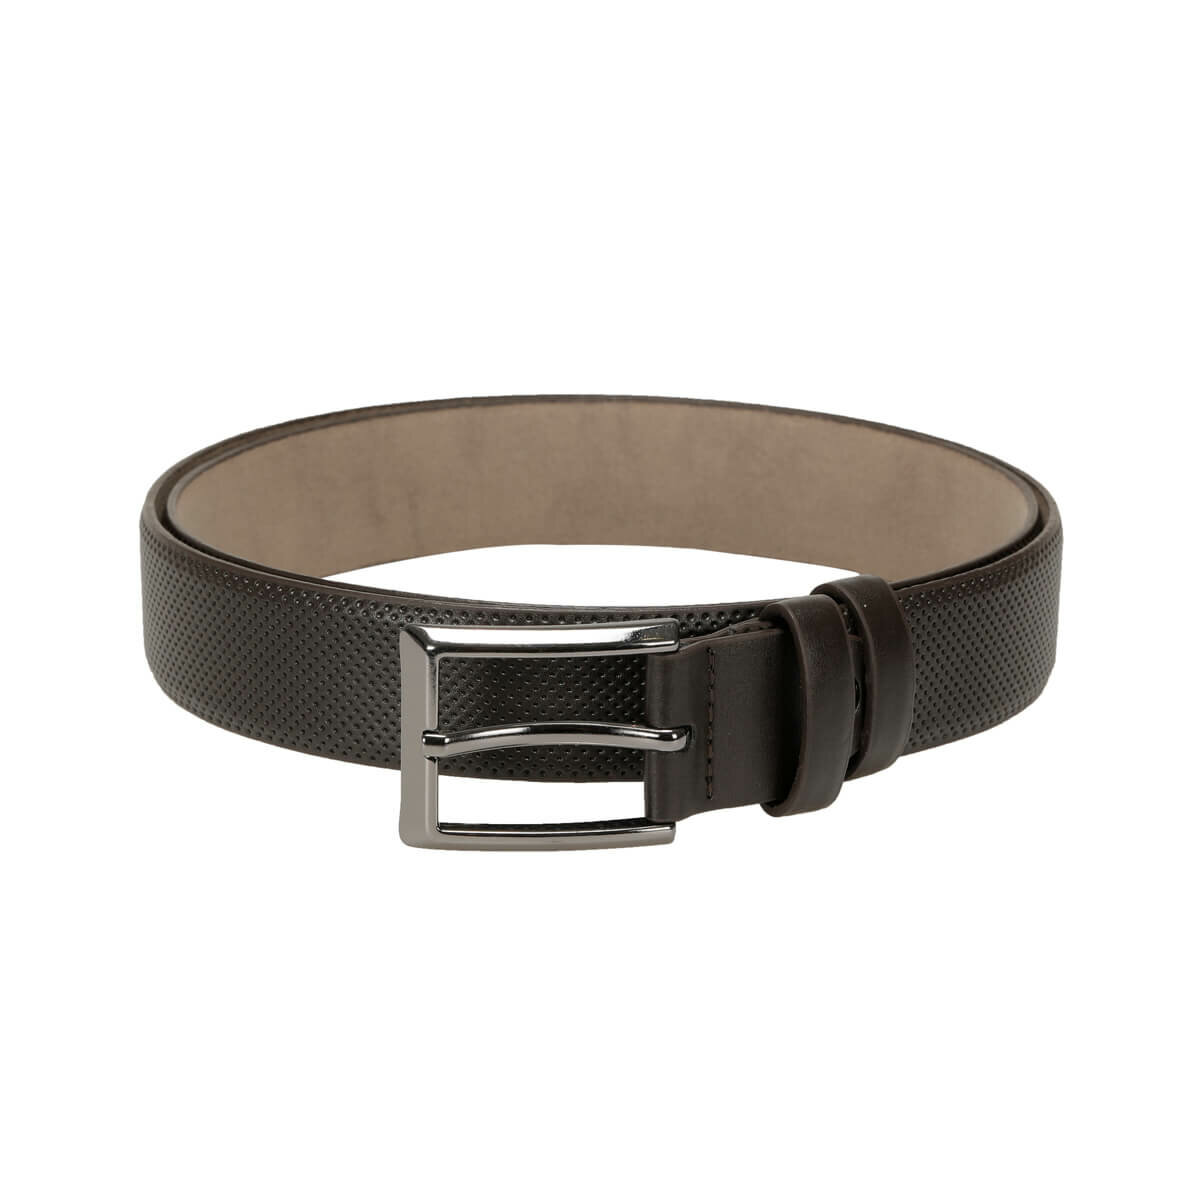 FLO MBRA3511 Brown Men 'S Belt Garamond